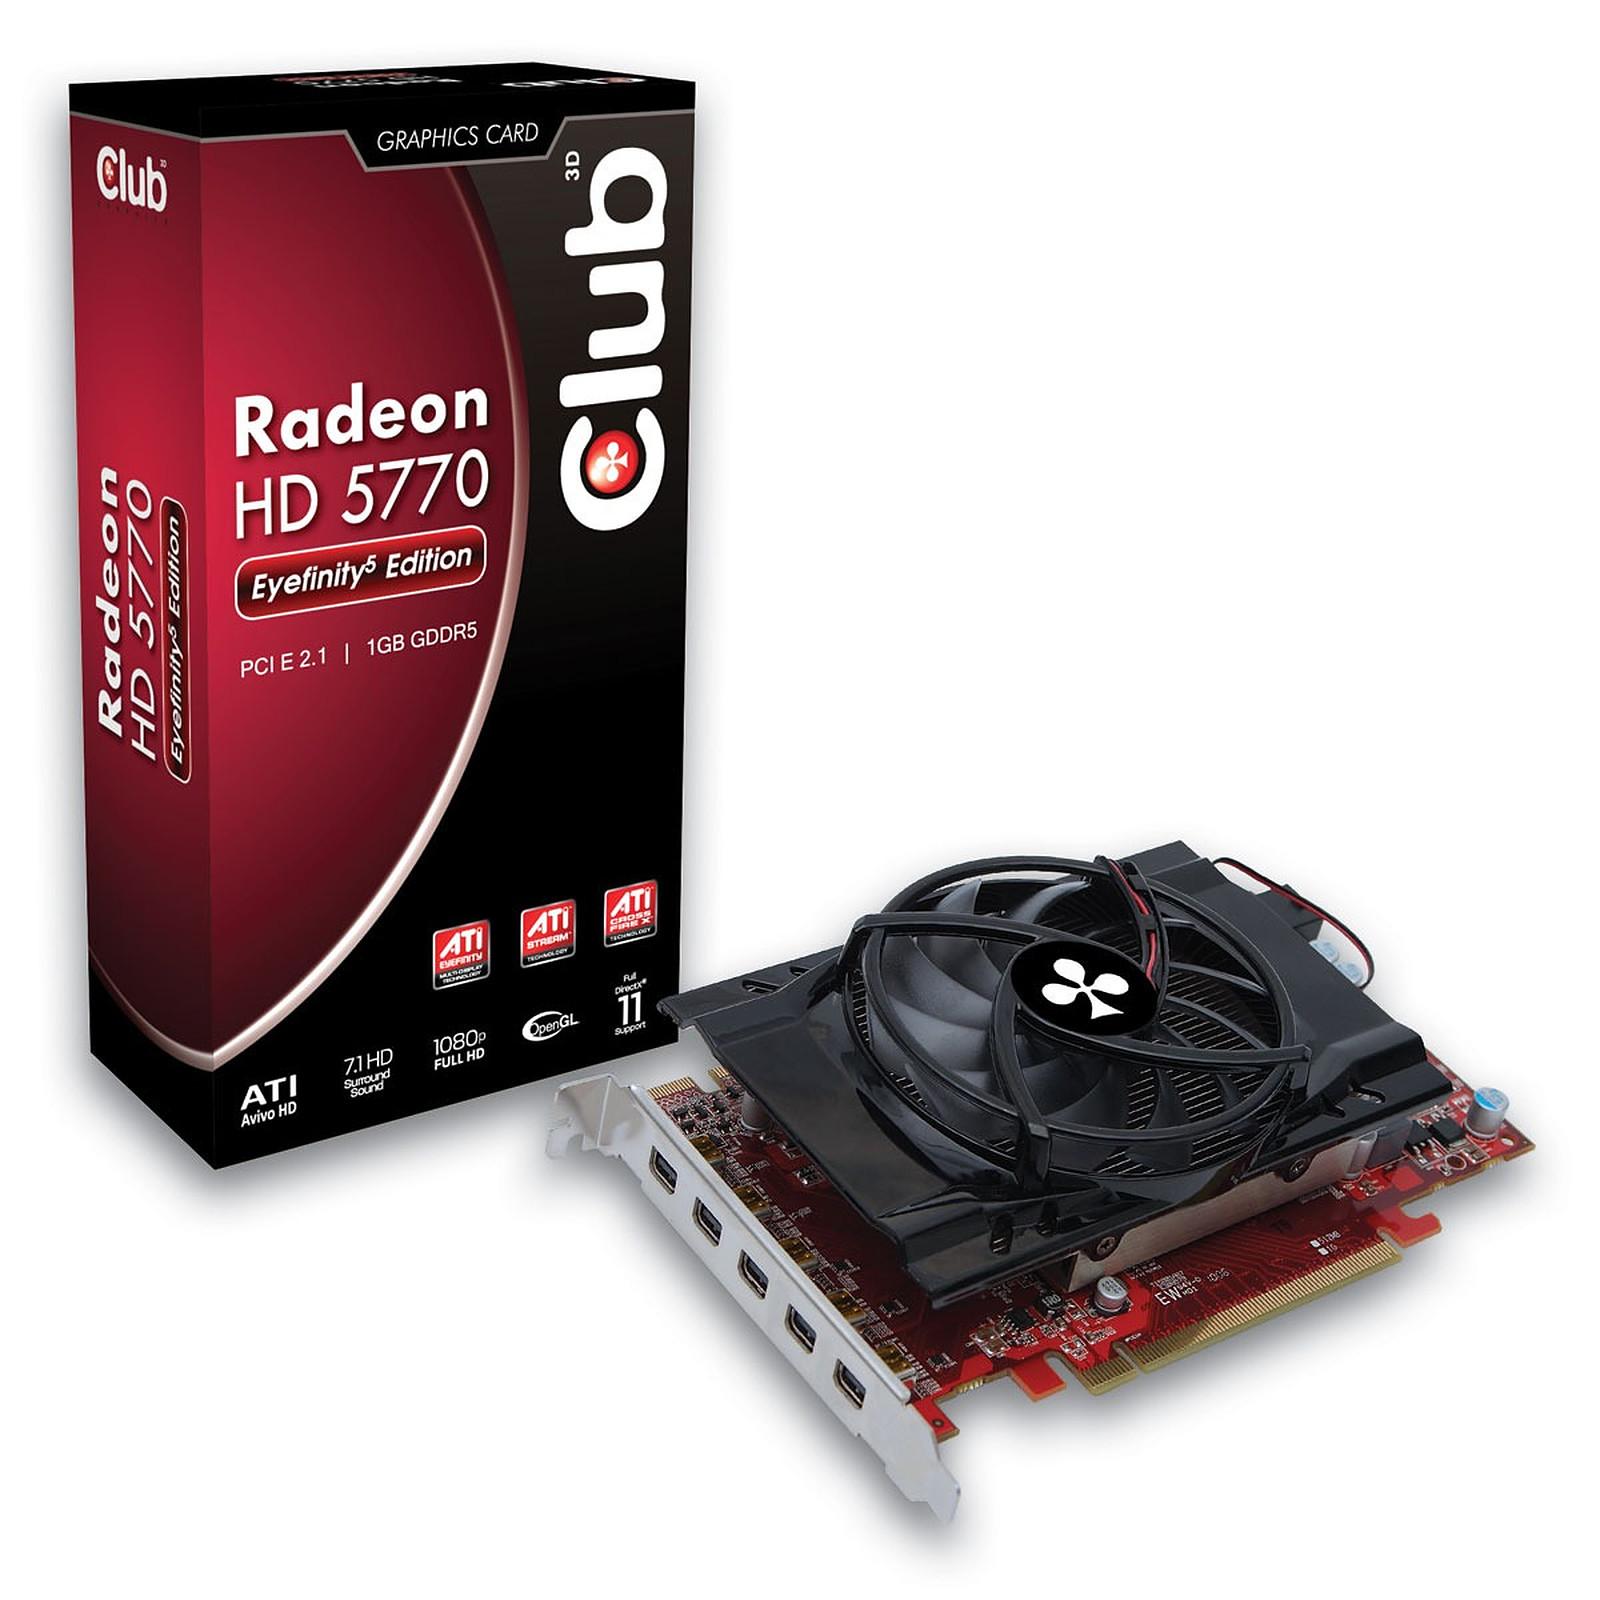 Club 3D Radeon HD 5770 Eyefinity 5 Edition 1 GB